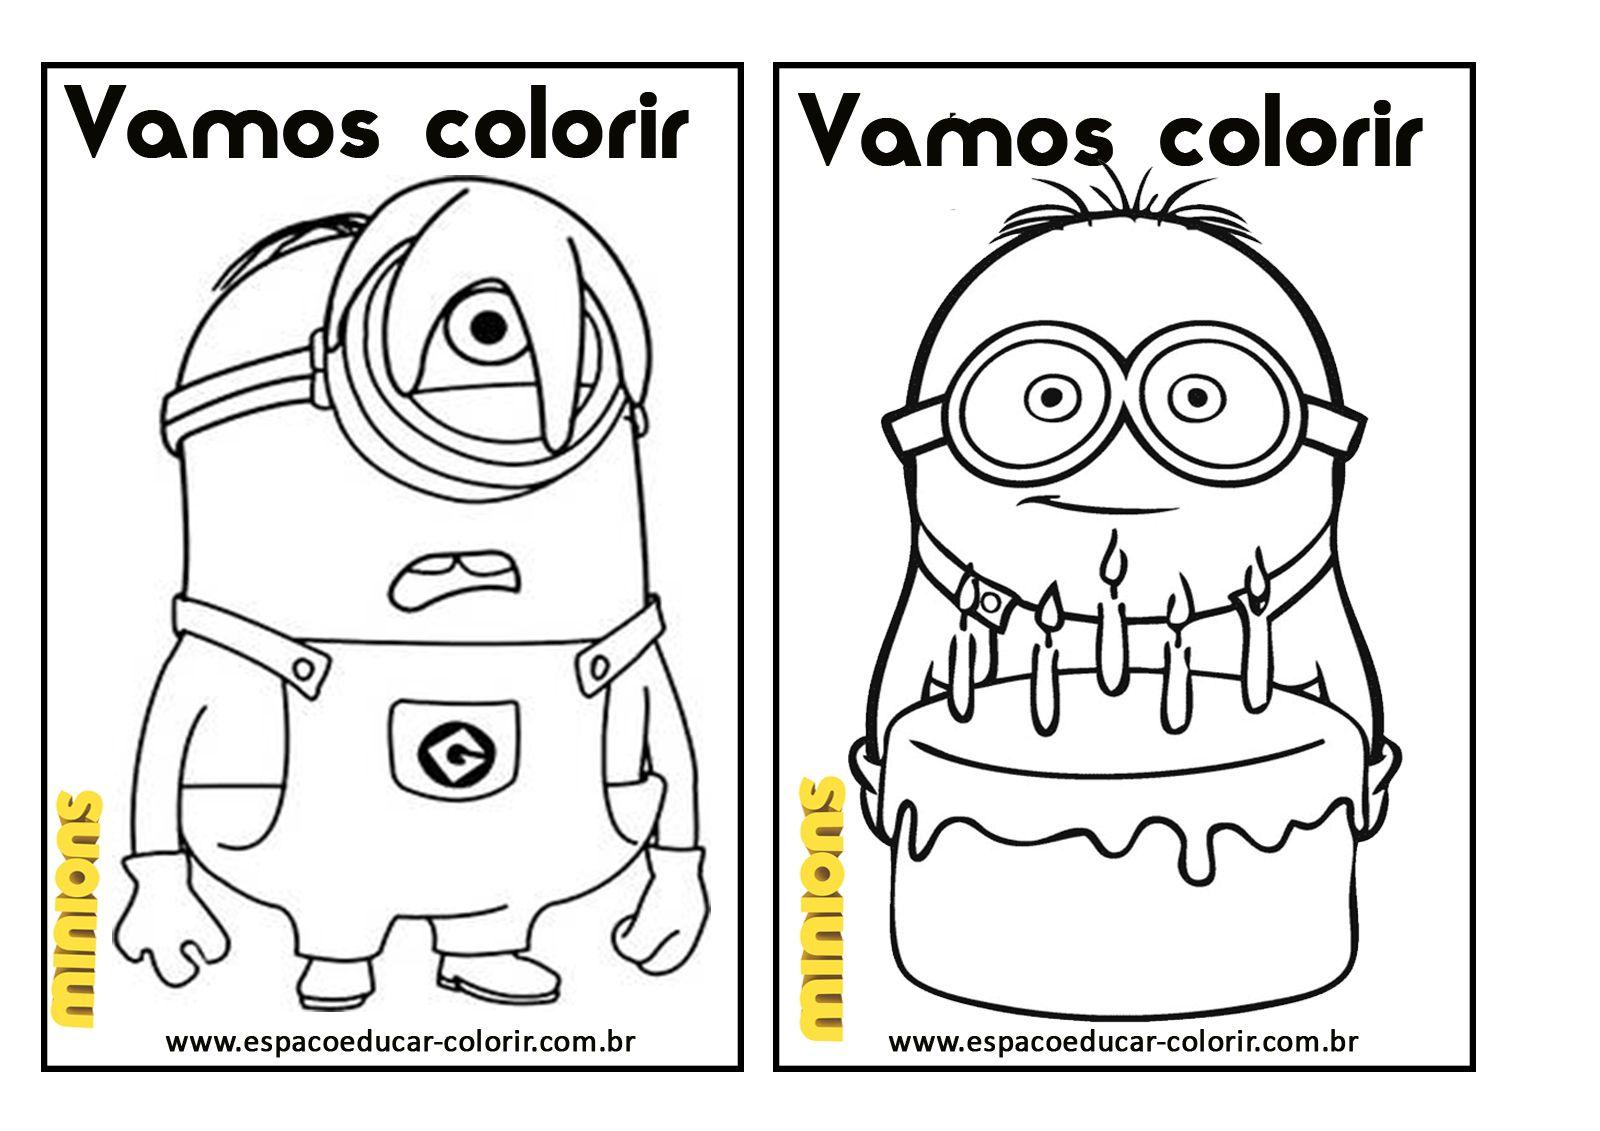 Espaco Educar Desenhos Para Colorir Livro De Colorir Dos Minions